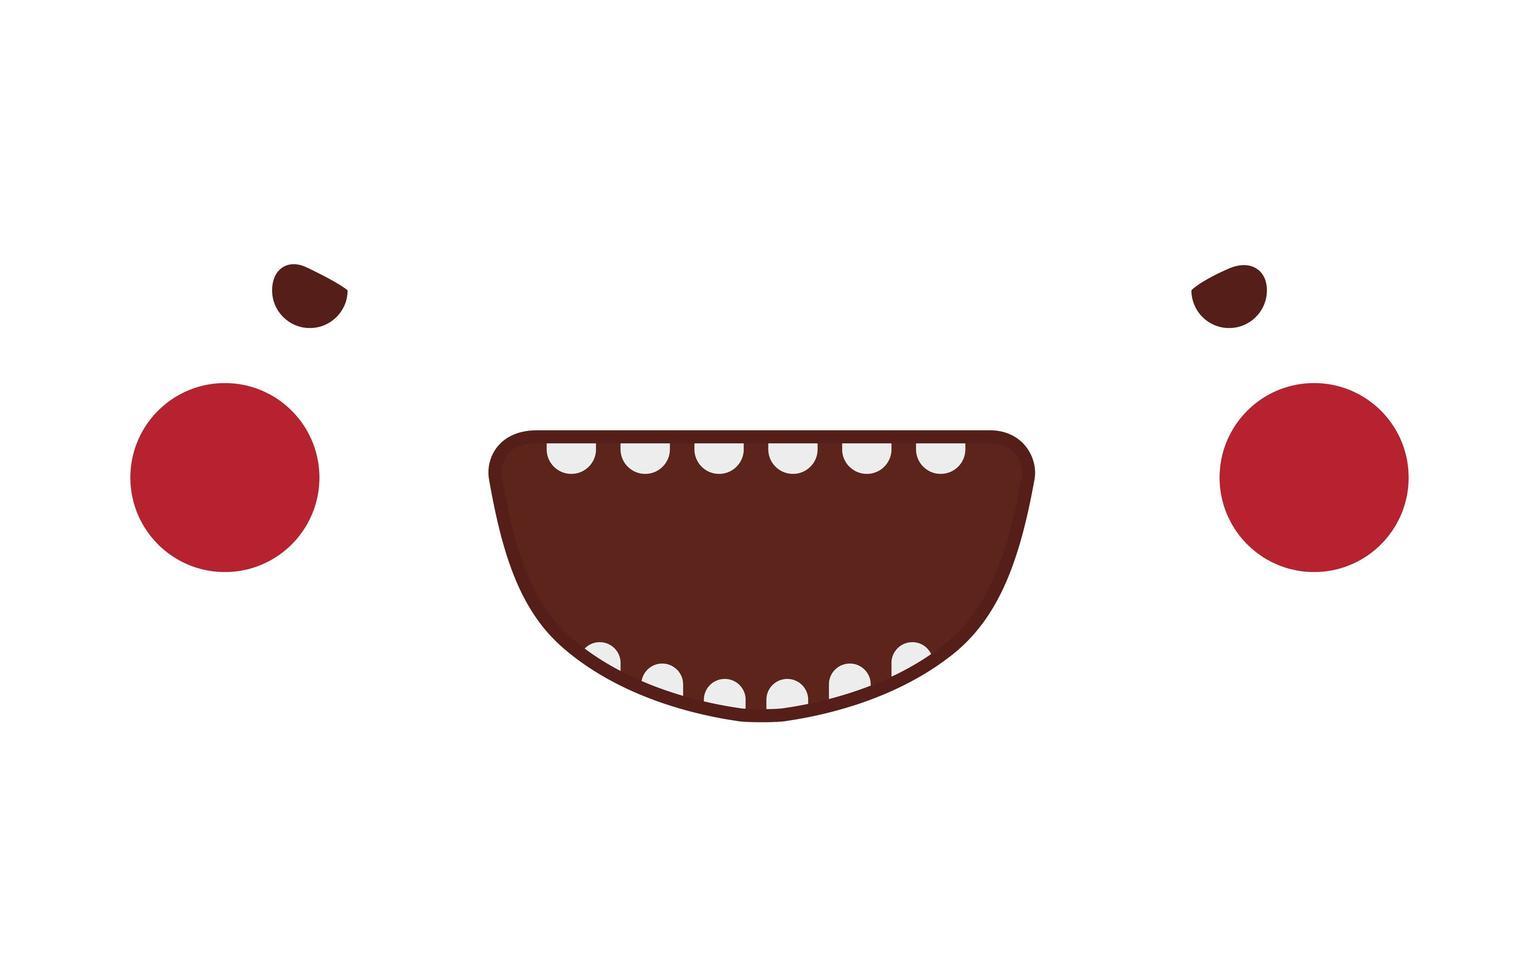 visage de dessin animé diable kawaii avec dessin vectoriel